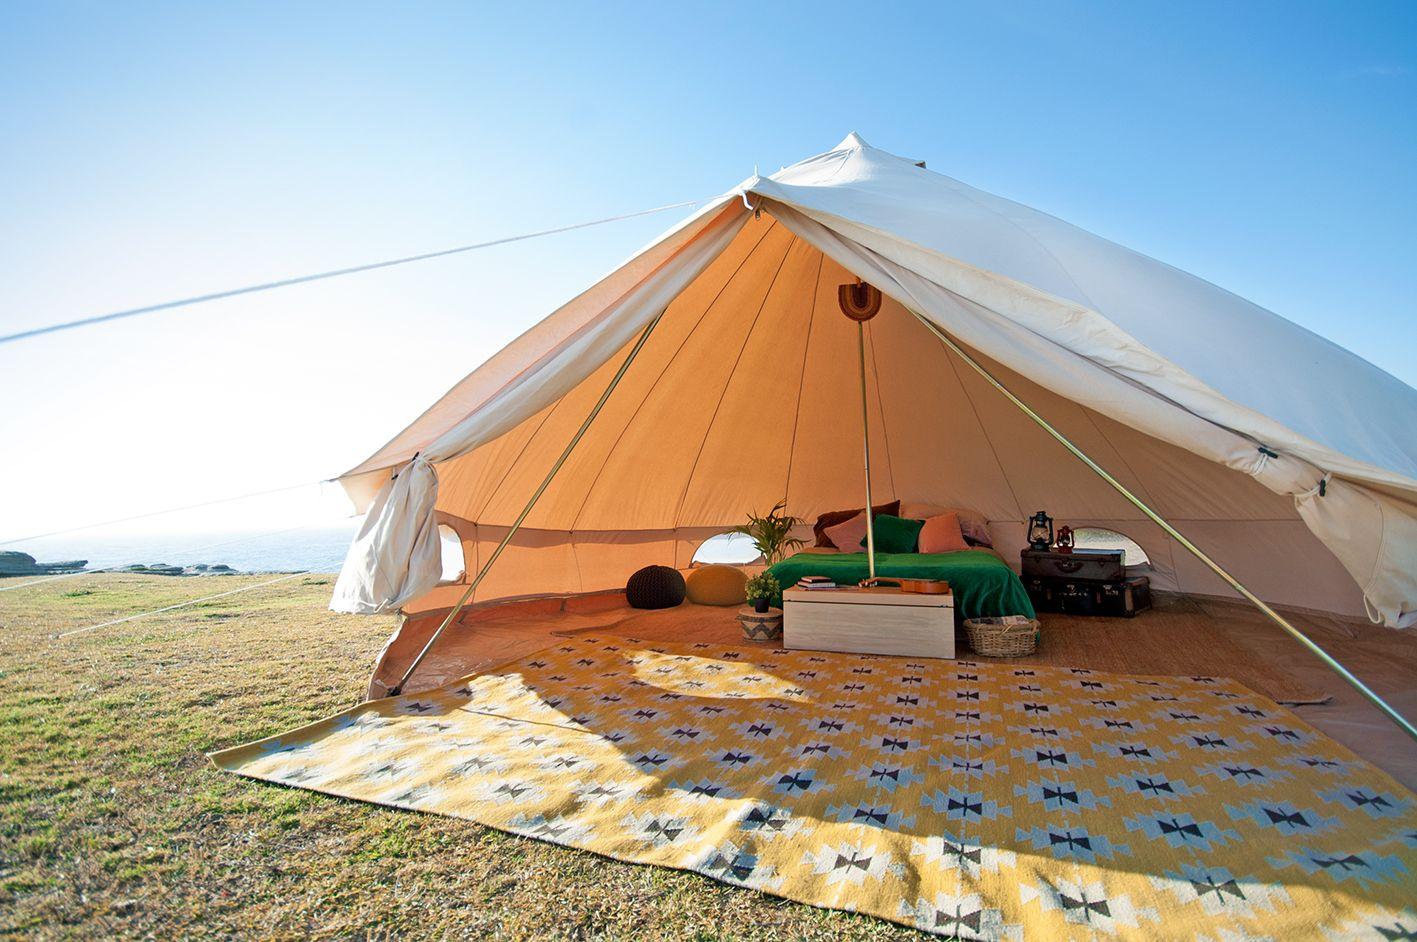 Breathe Bell Tents Australia - Ideal Tent for Australian Climate & DSC_0179_editlowres.jpg (1417×942) | Tent | Pinterest | Tents